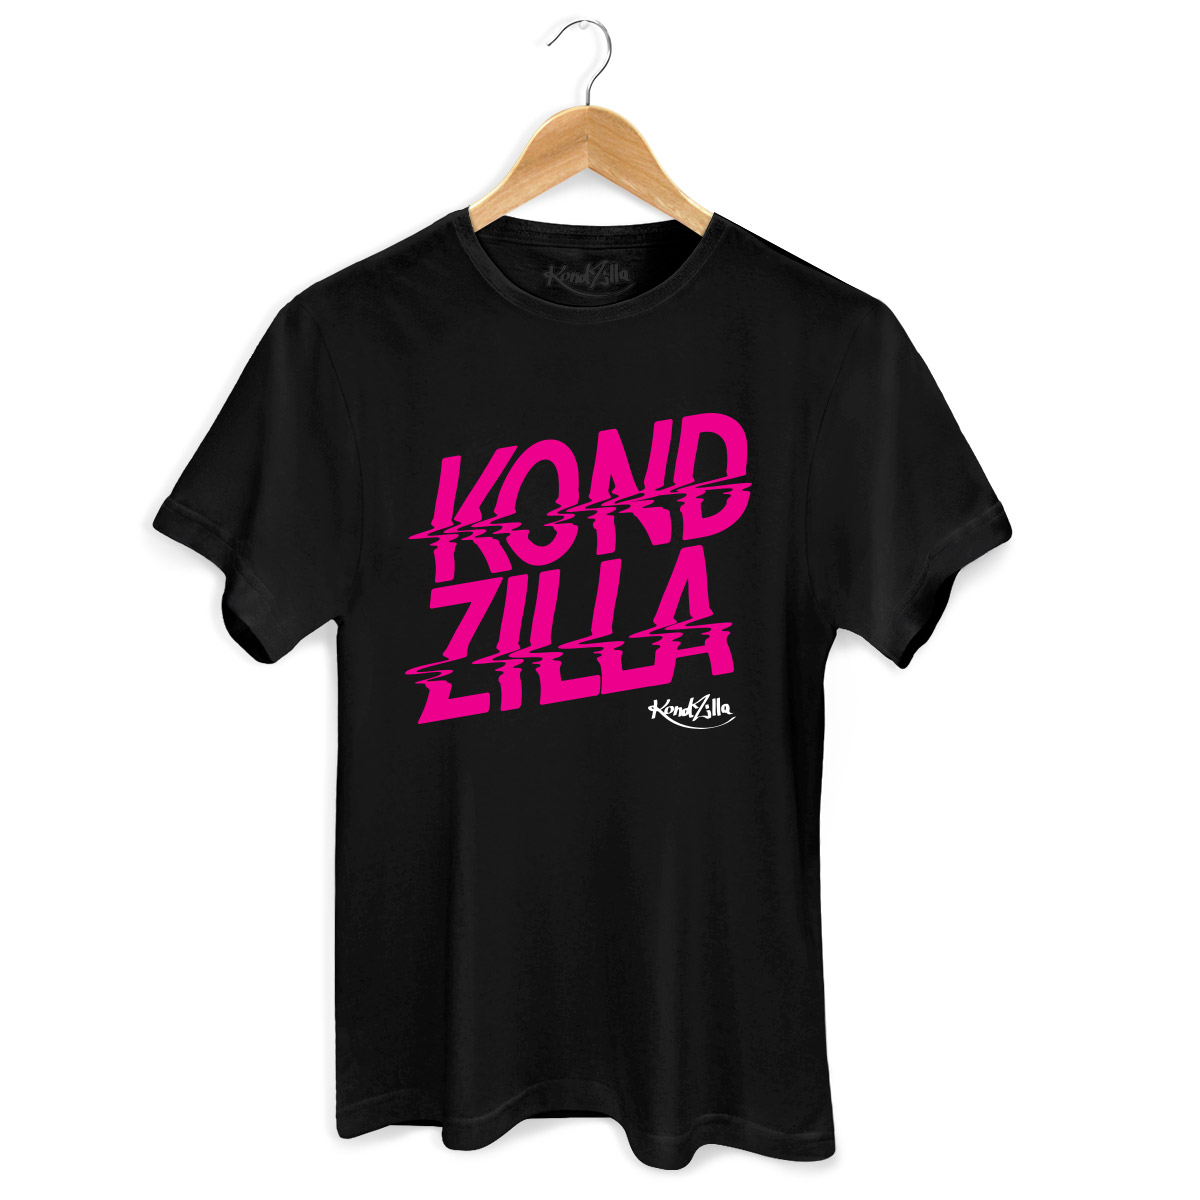 Camiseta Masculina Kondzilla Dance